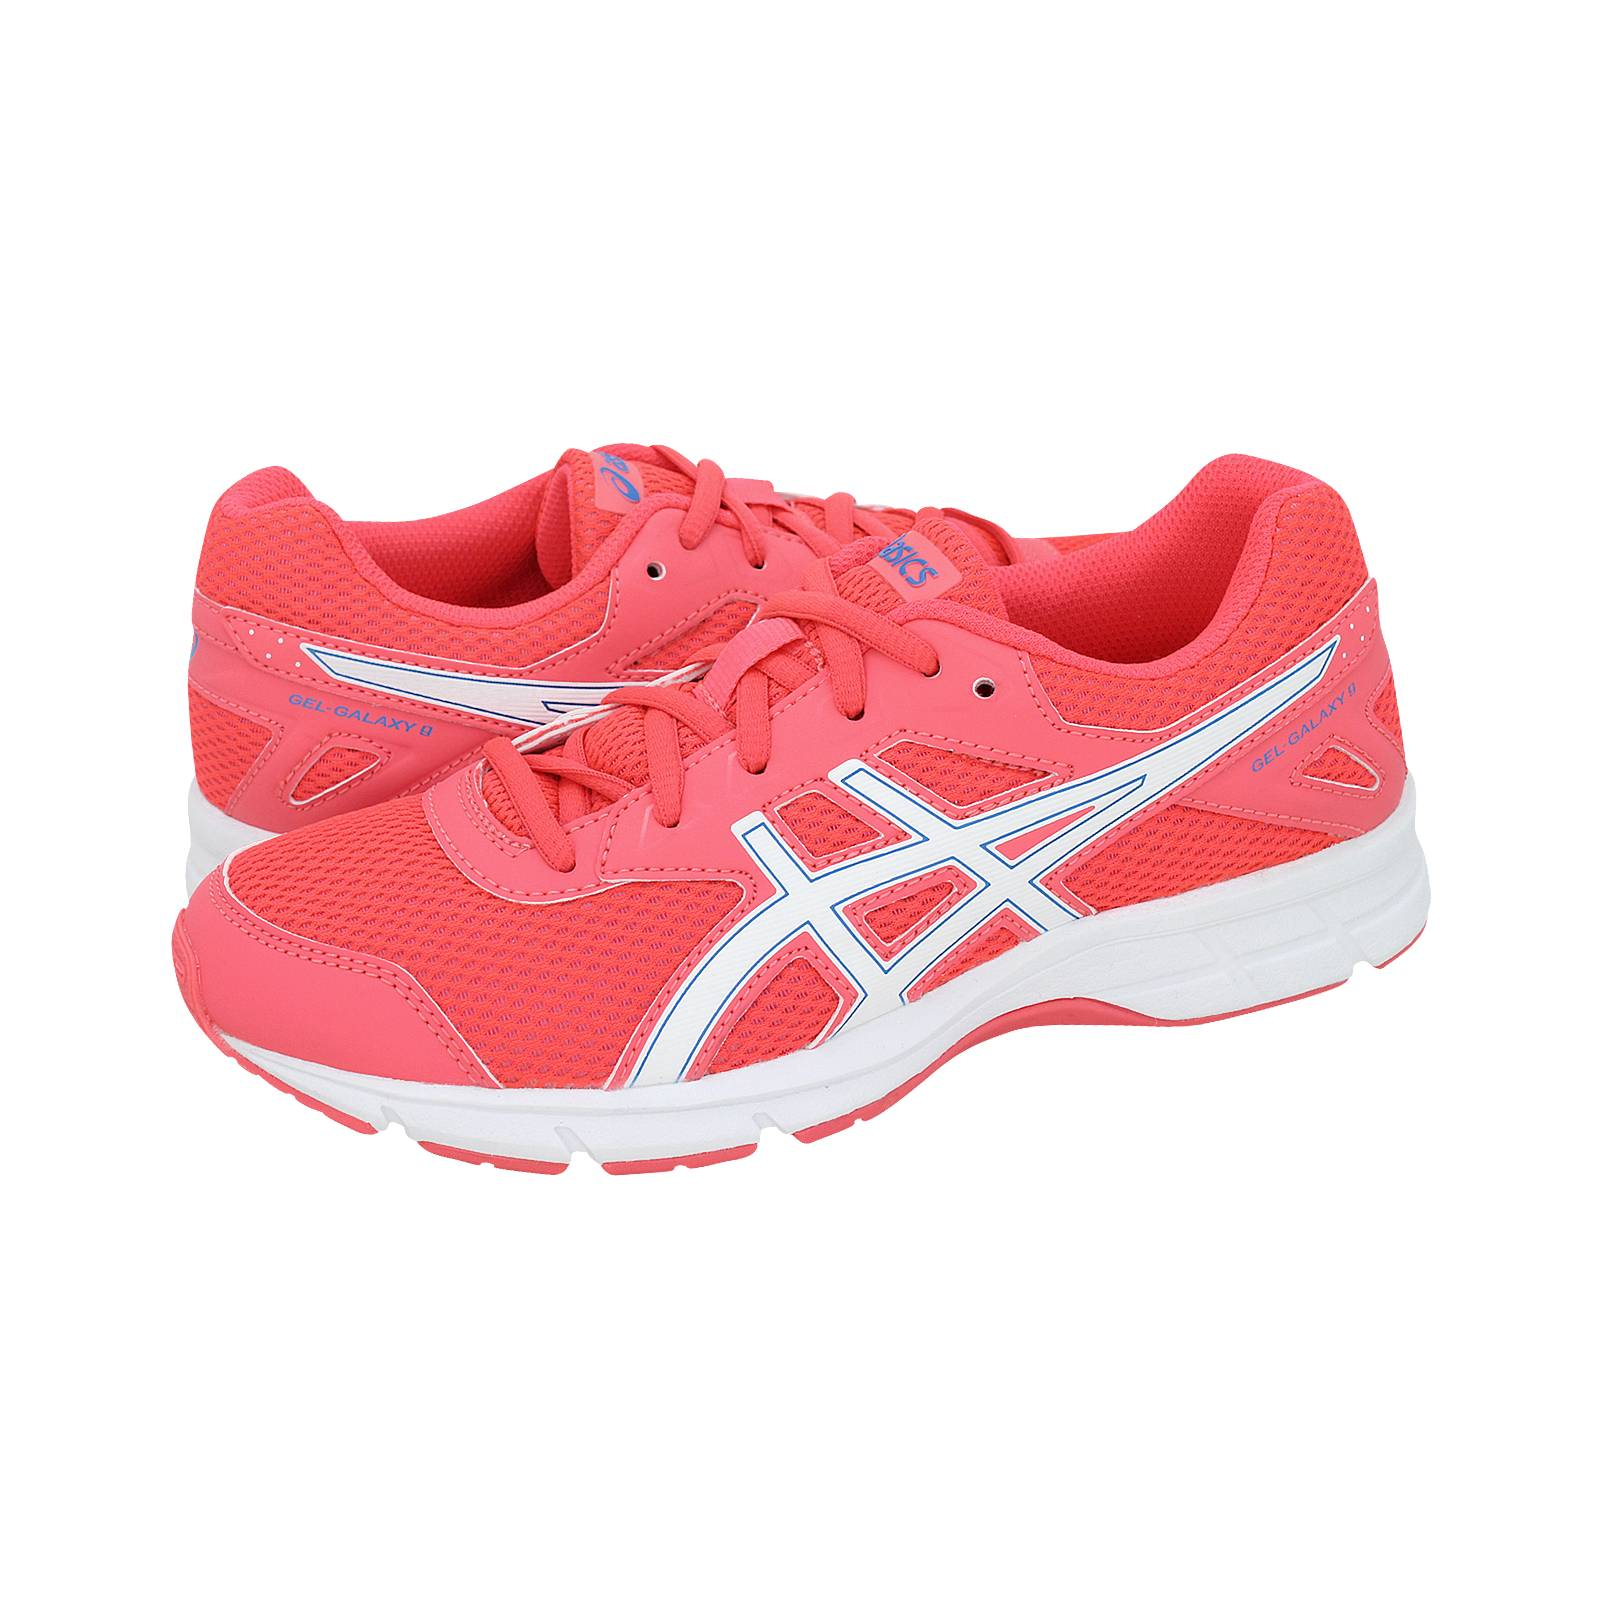 Gel-Galaxy 9 GS - Παιδικά αθλητικά παπούτσια Asics από υφασμα και ... de05939be5b